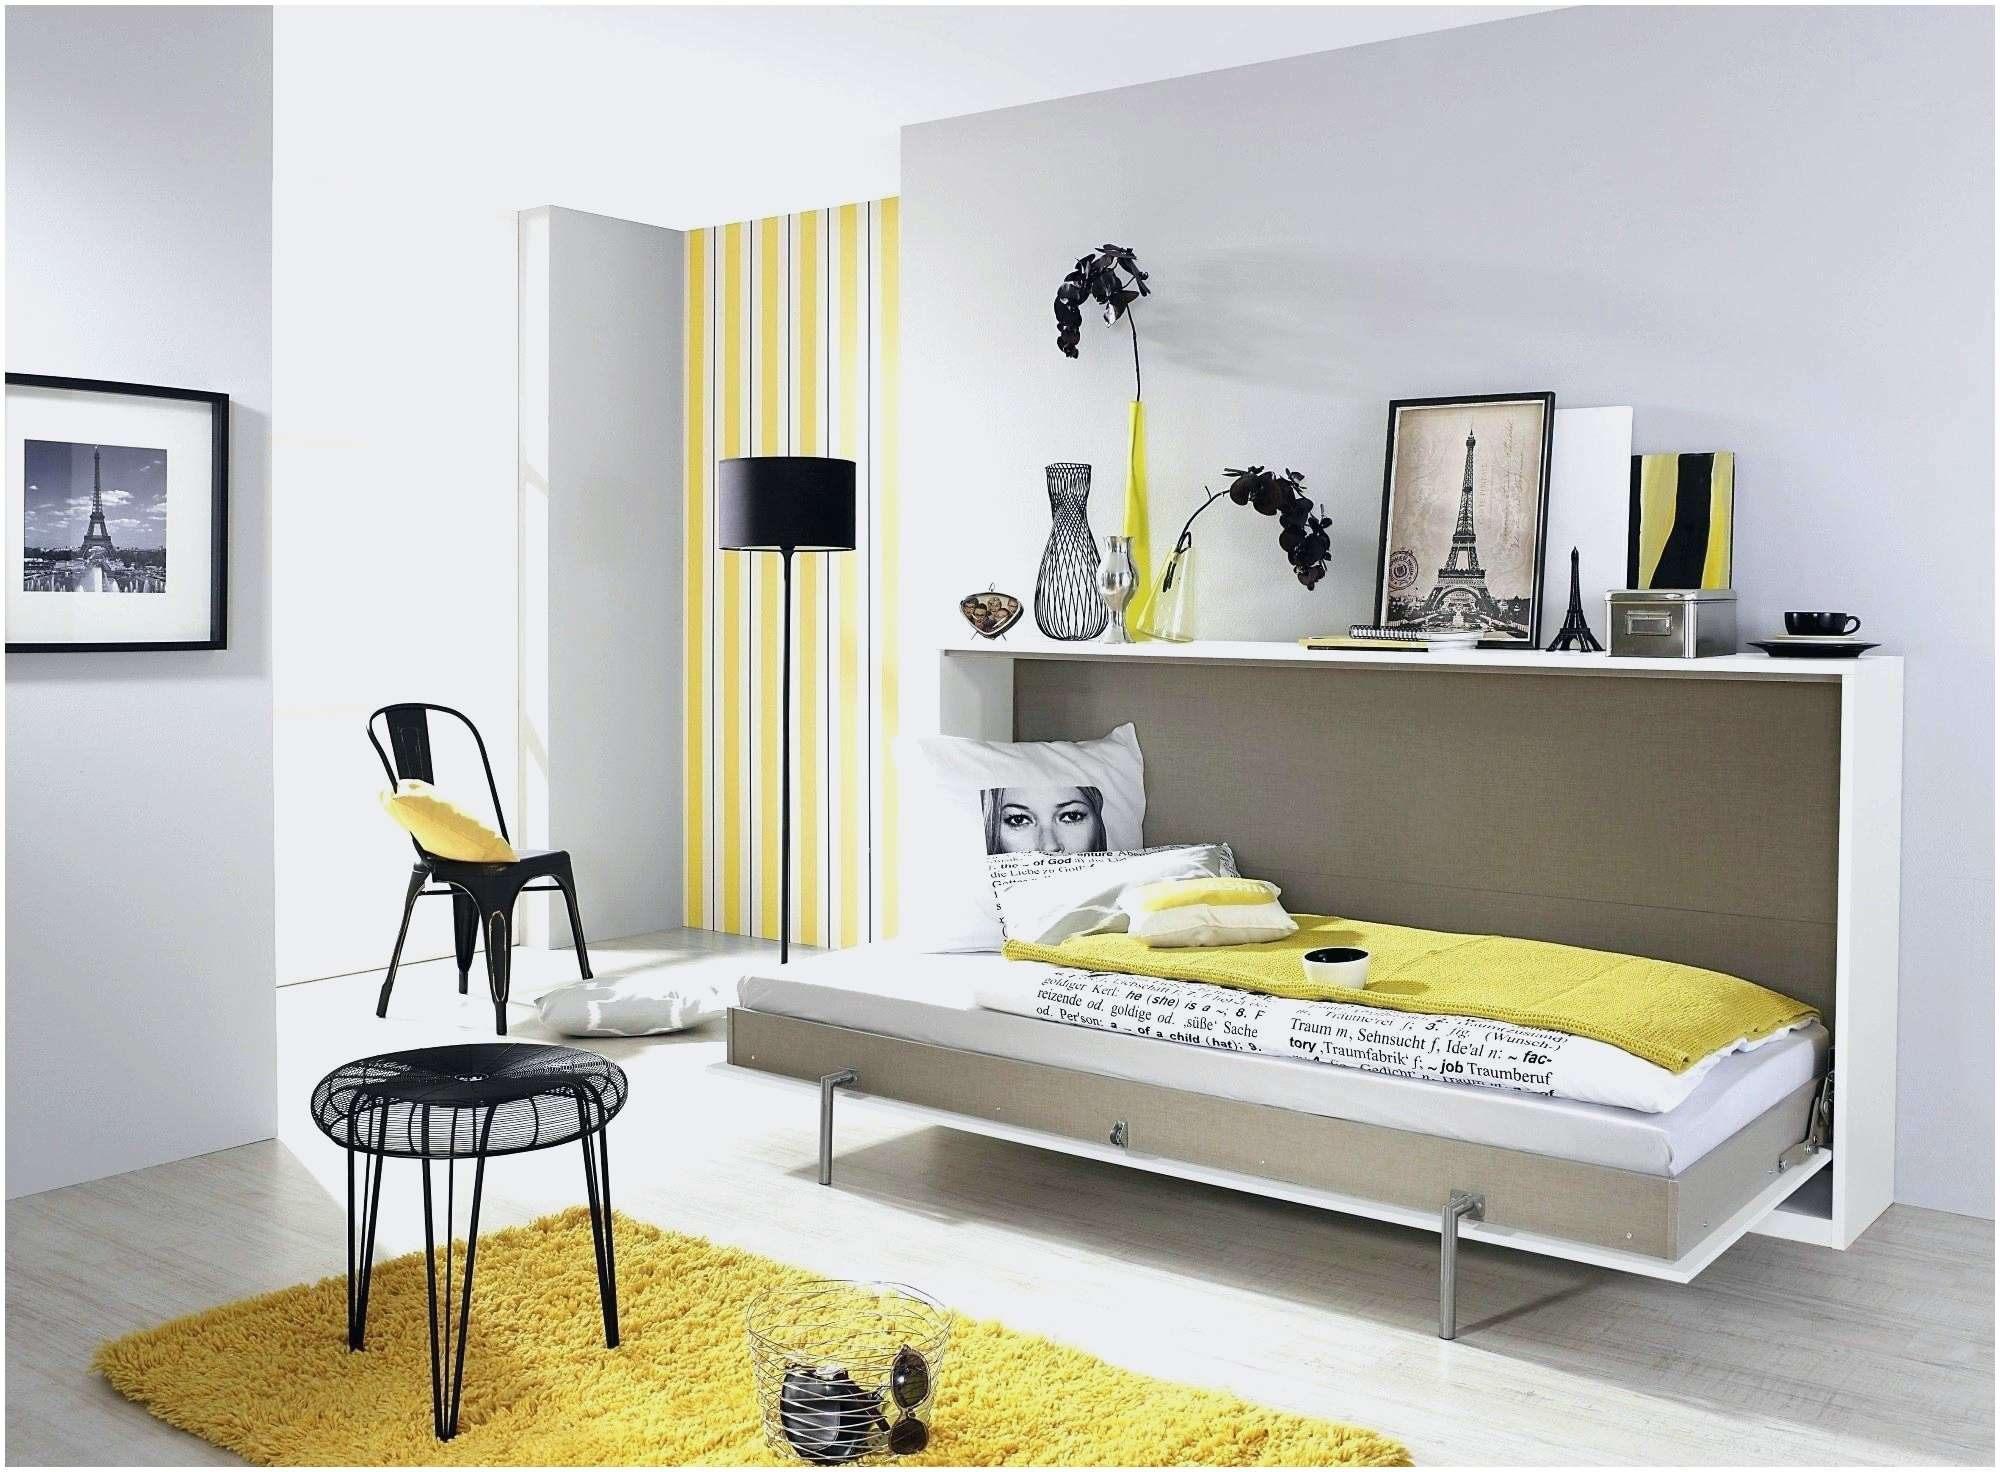 55 Lit Escamotable Canapé Ikea Scheme jongor4hire